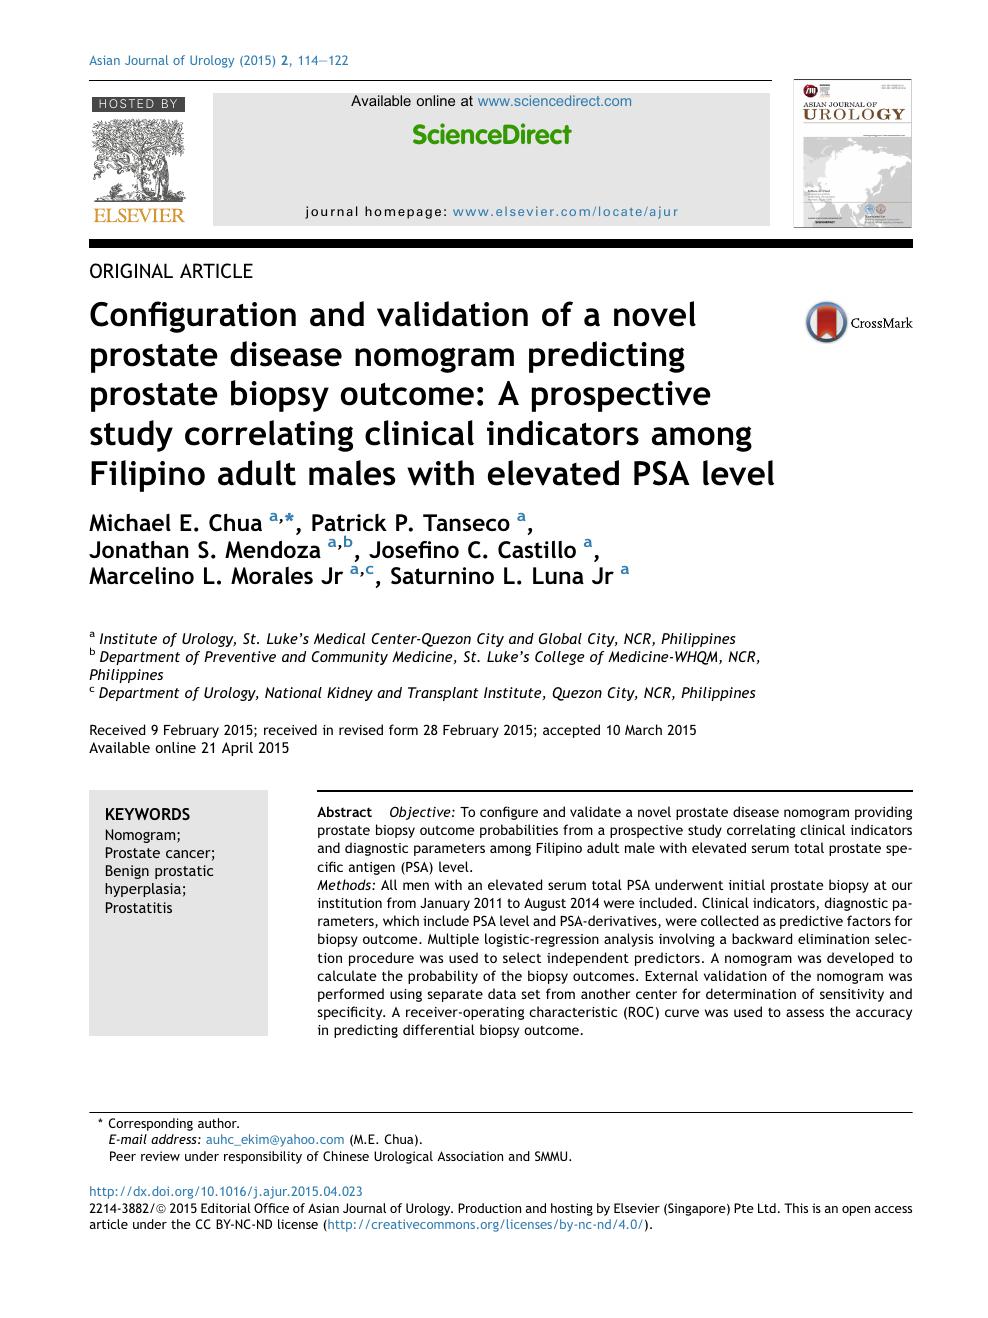 Configuration and validation of a novel prostate disease nomogram